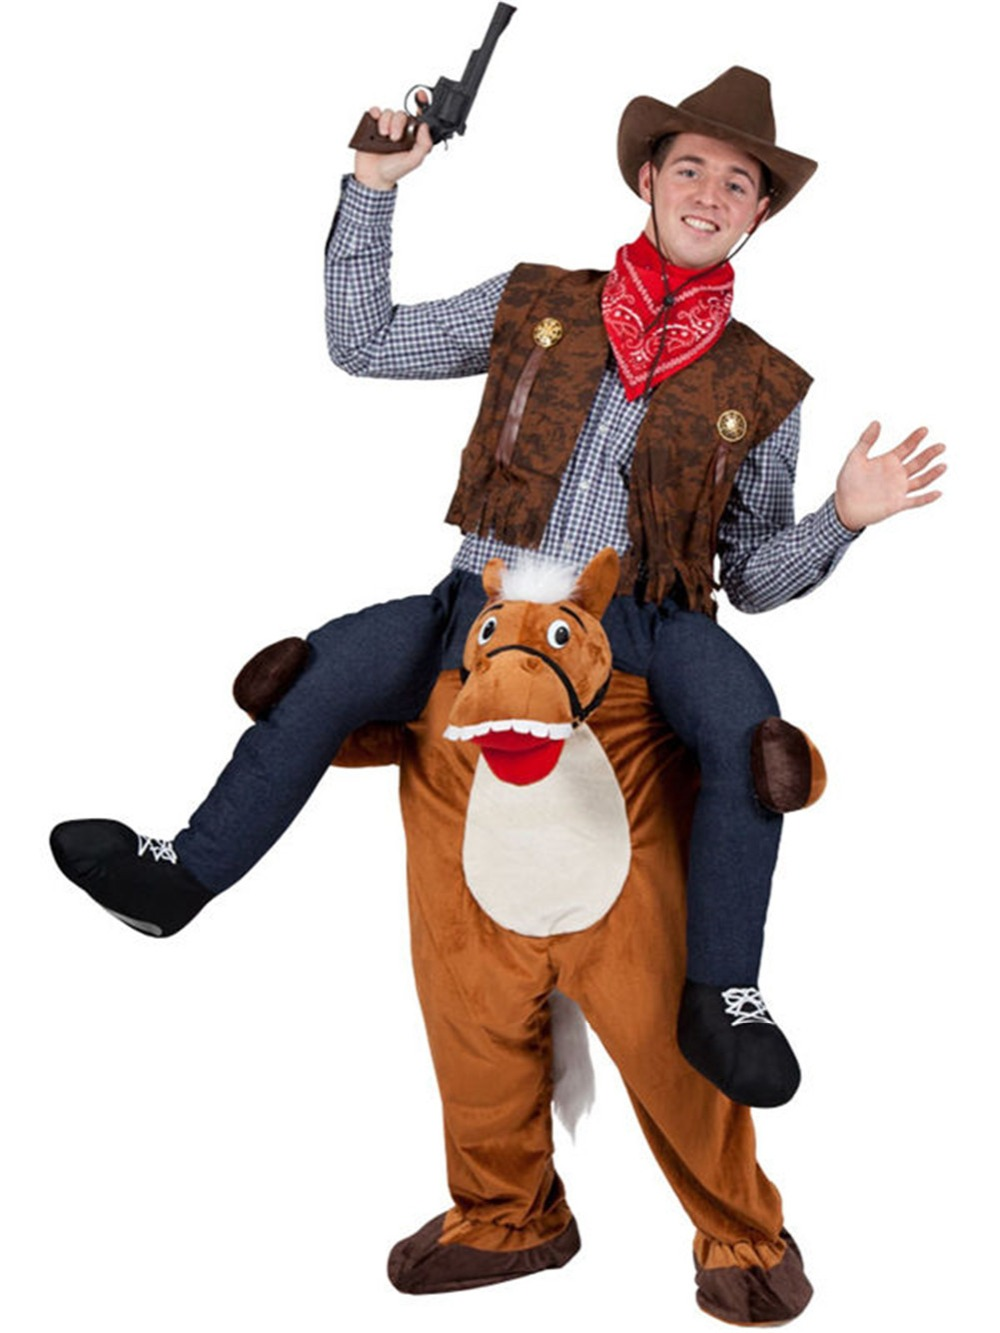 Halloween Tour sur Cheval Fantaisie Robe Mascotte Costume